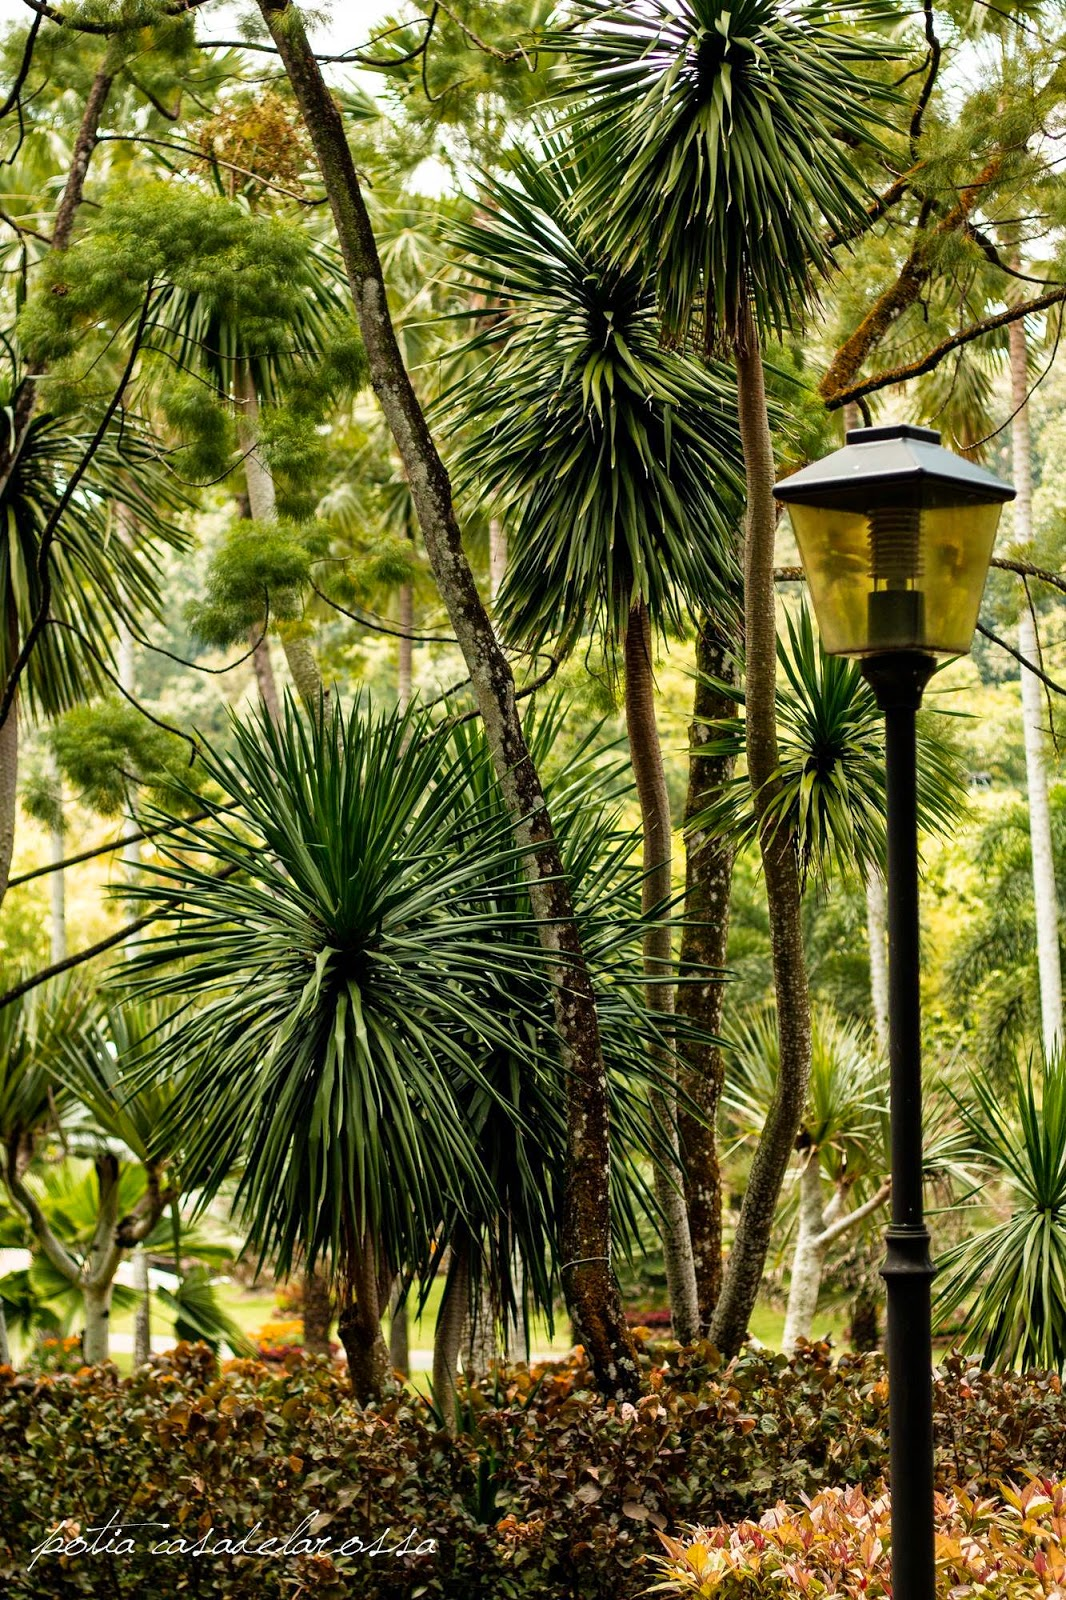 Taman Botani Perdana Kuala Lumpur